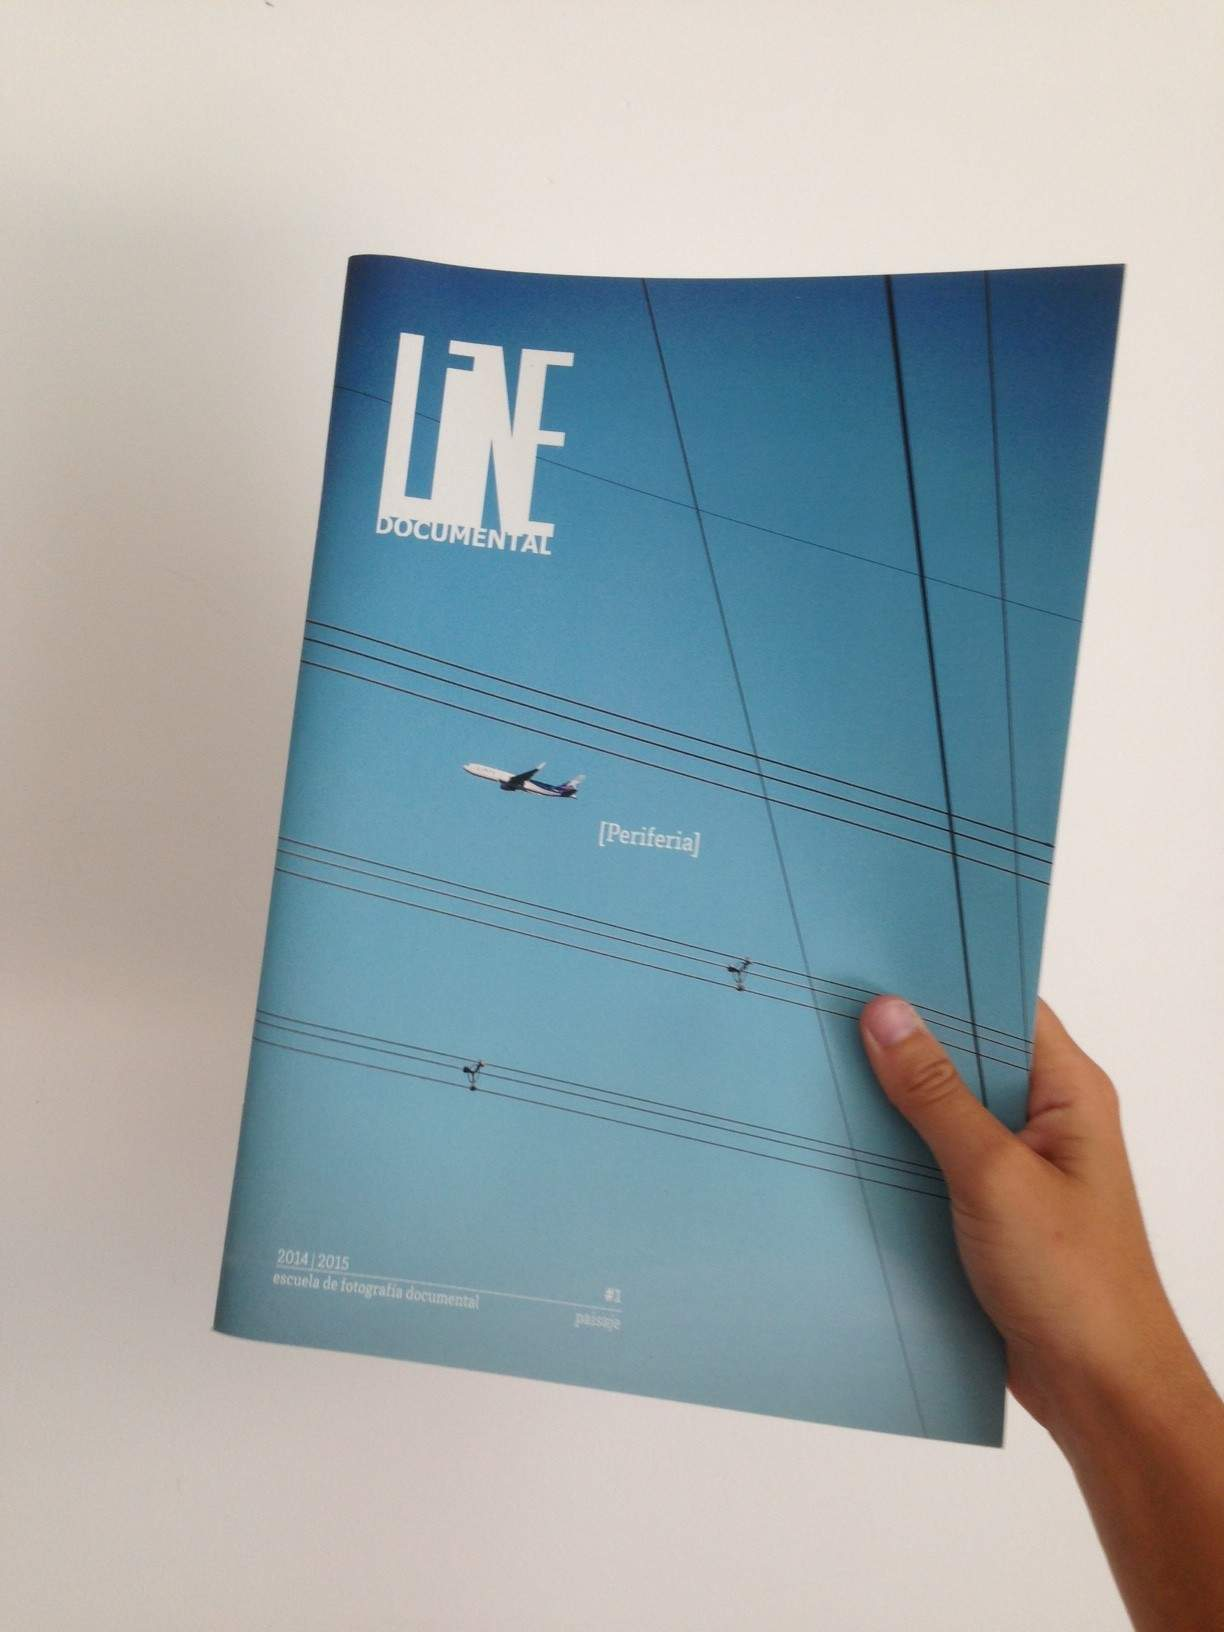 Ejemplo de revista que ha sido impresa online en La Imprenta CG